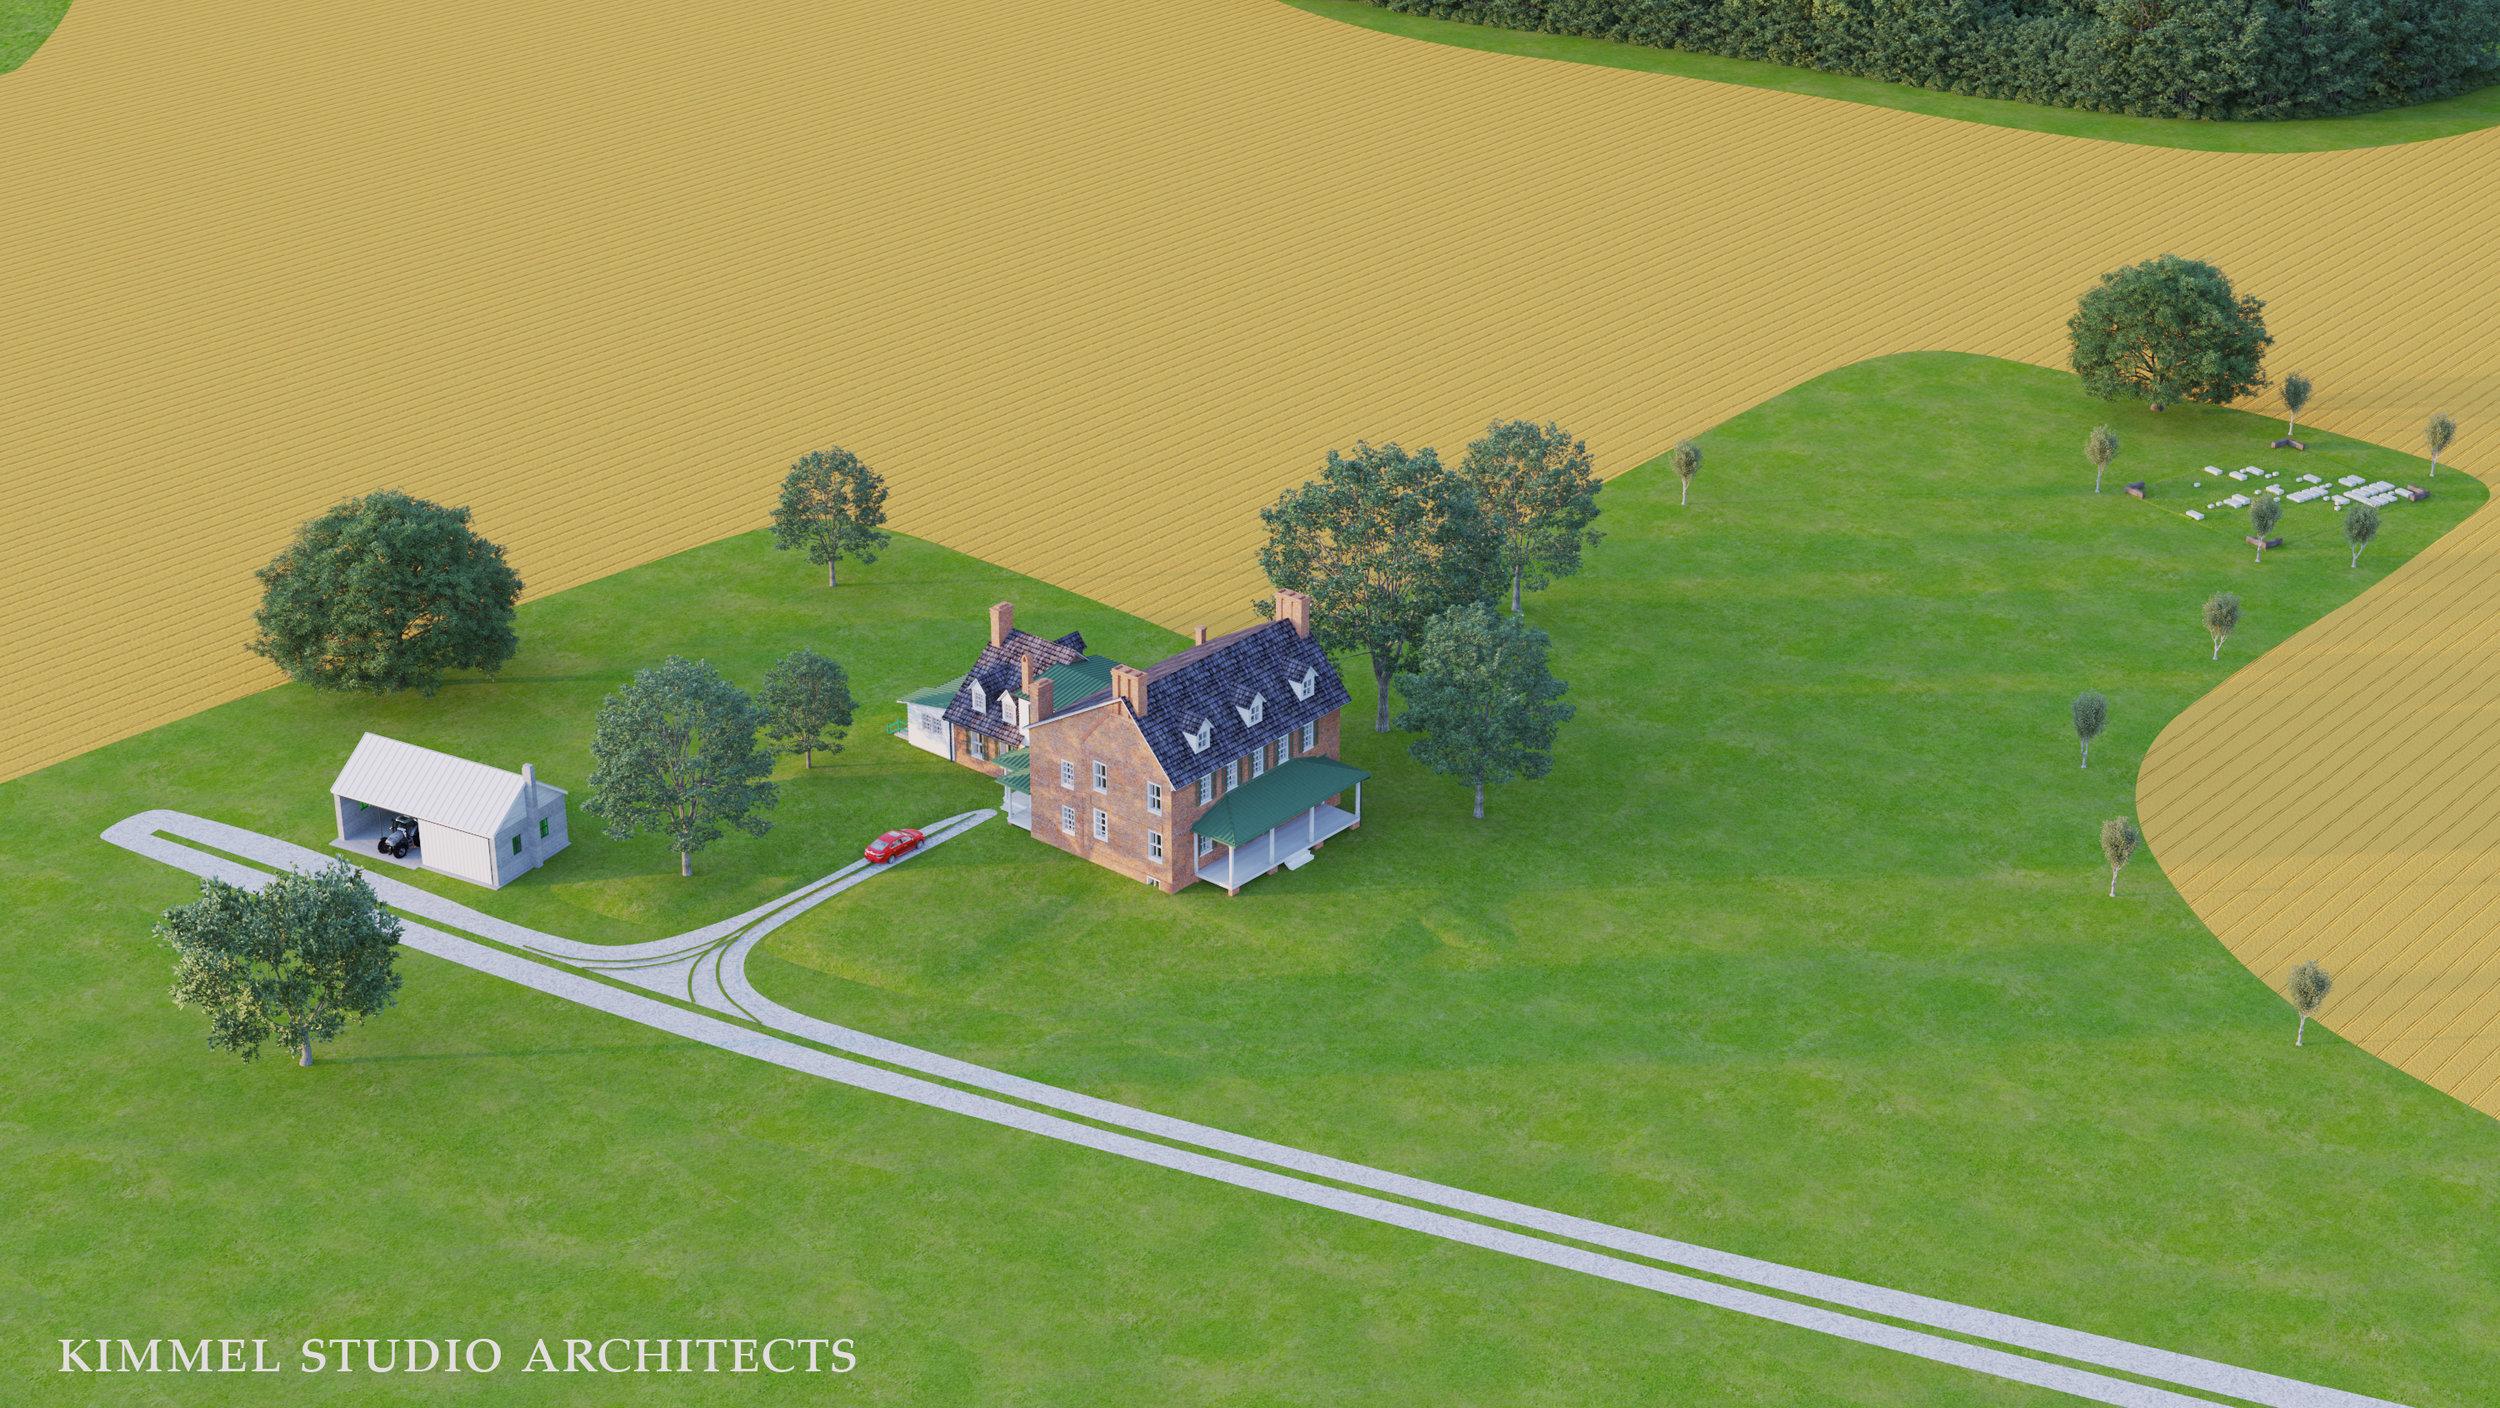 Kimmel Studio Architects - Cloverfields 3D Studies - Existing Site Aerial.jpg